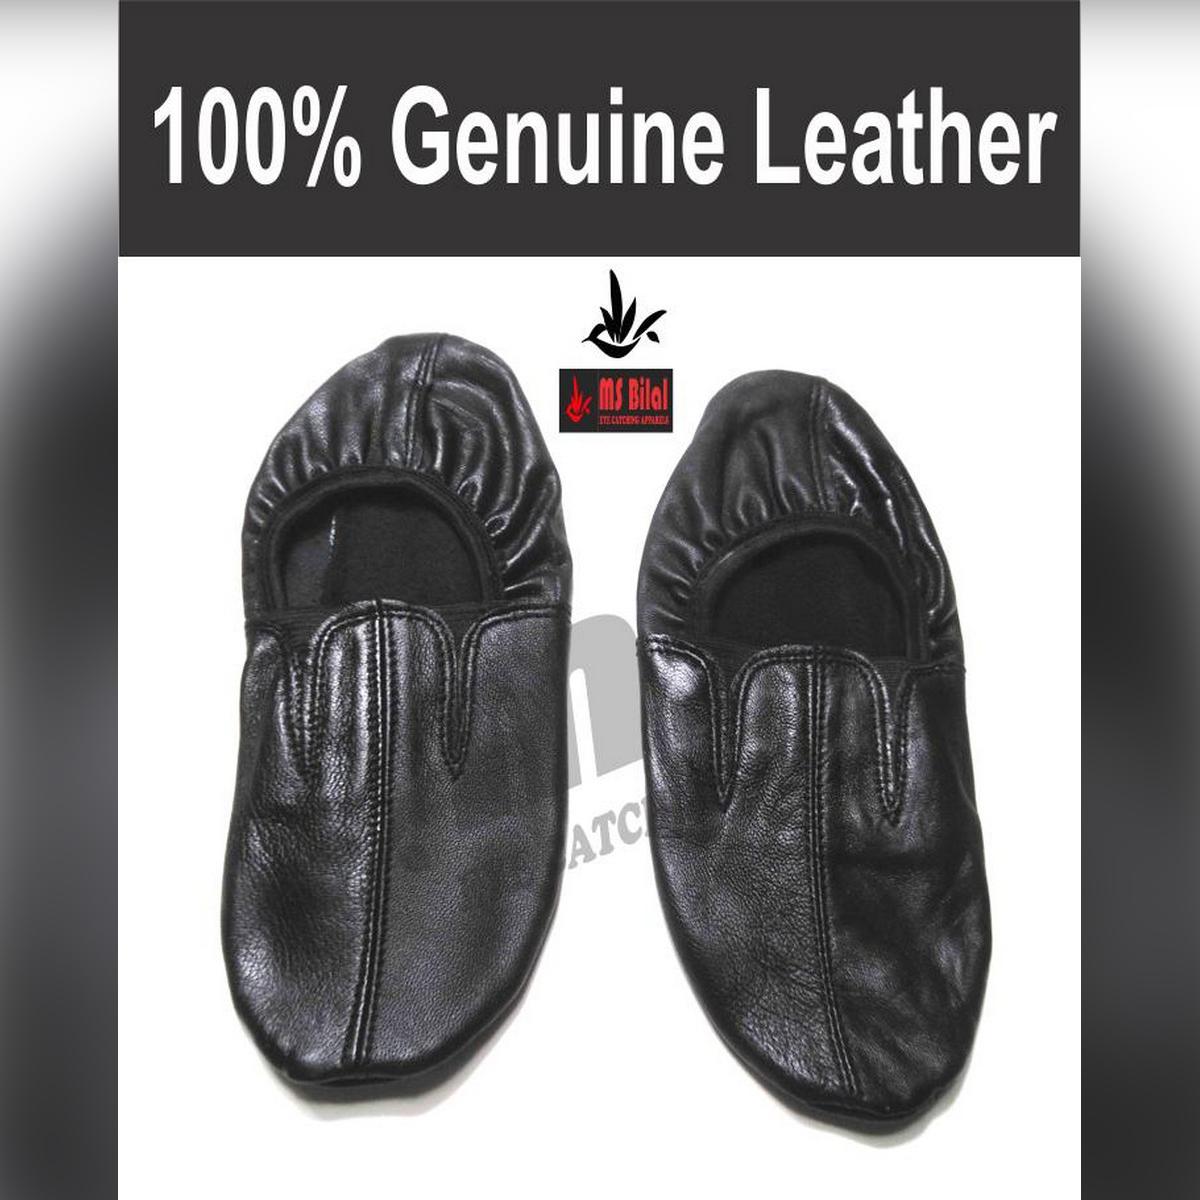 Leather Socks Boot 100% Genuine Leather Hajj Umrah Mozay for Men and Women - Black